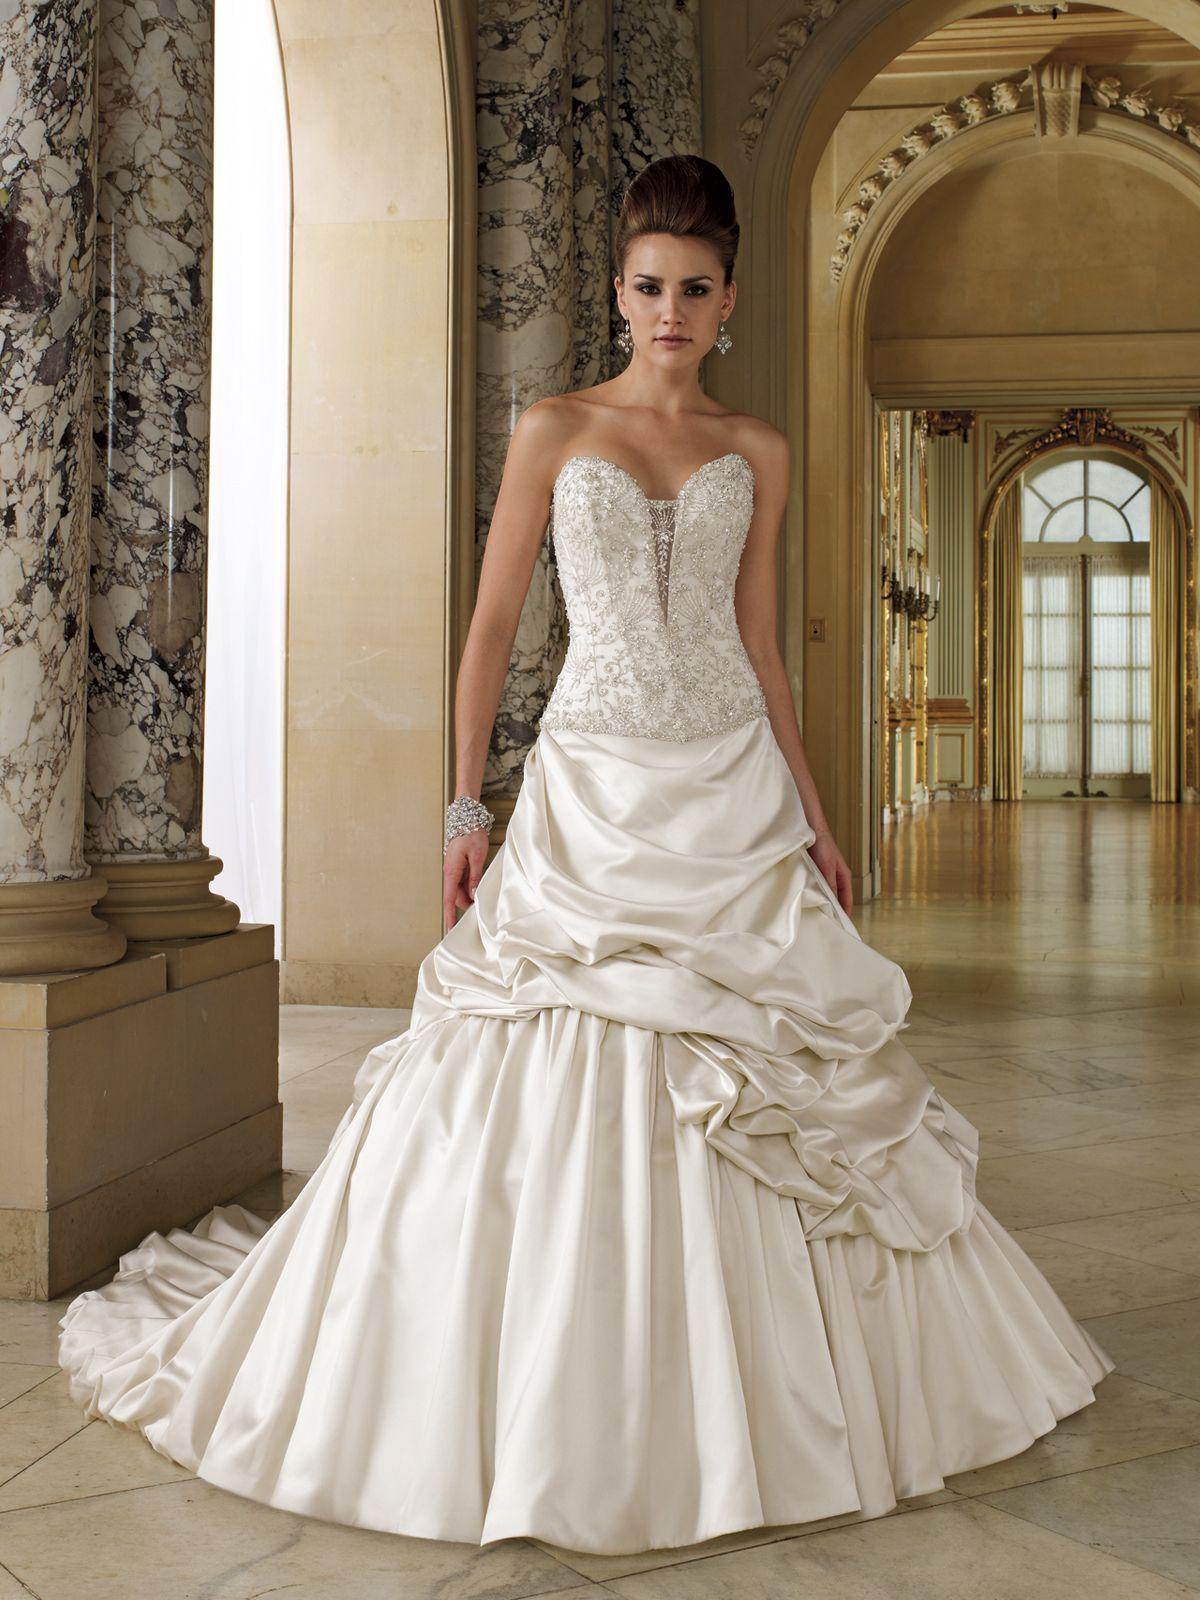 Pin by Kuek Qi on My Style | Pinterest | David tutera, Bridal gowns ...